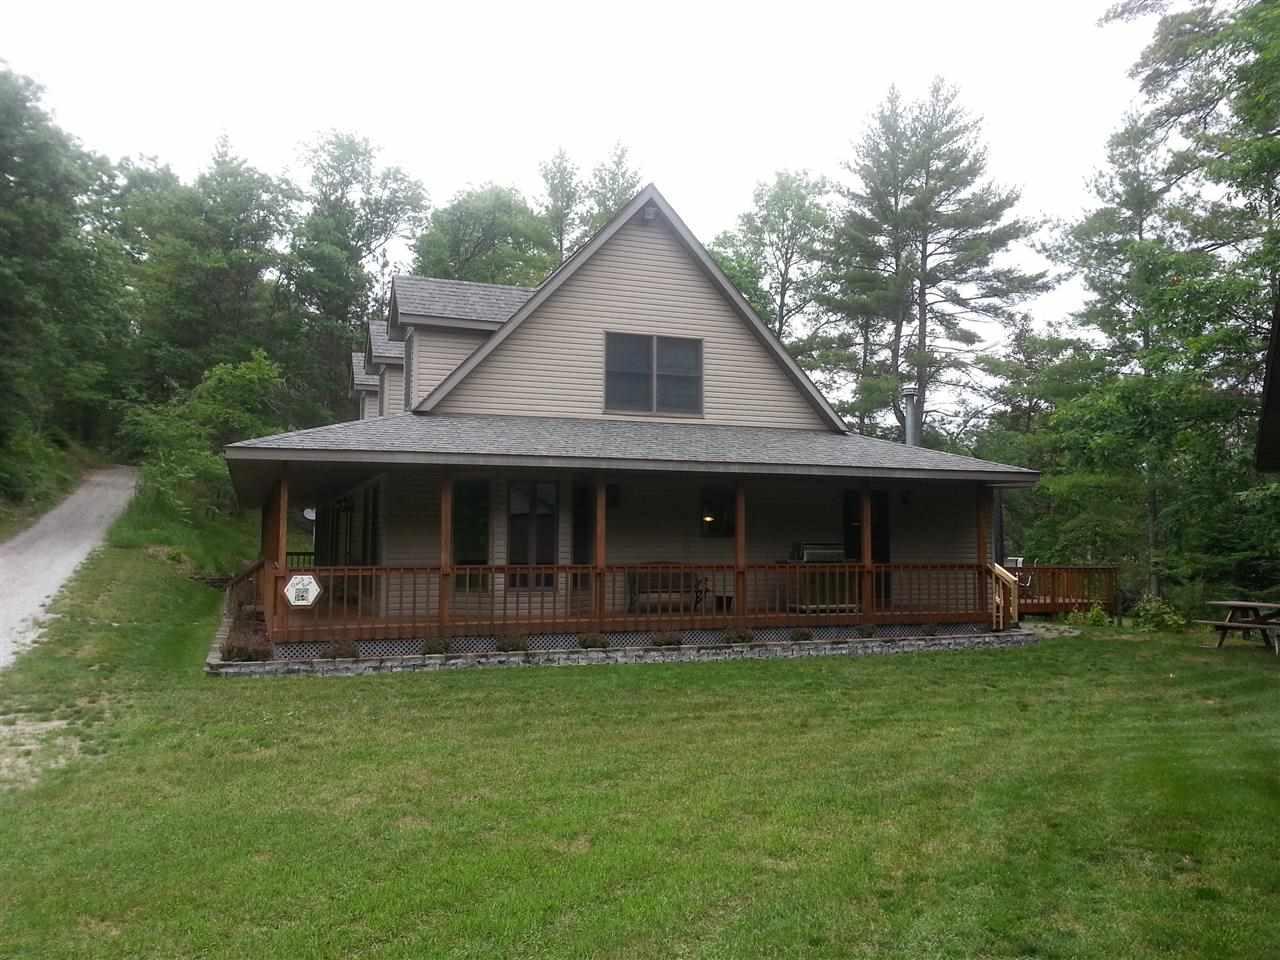 Real Estate for Sale, ListingId: 29756063, Grayling,MI49738